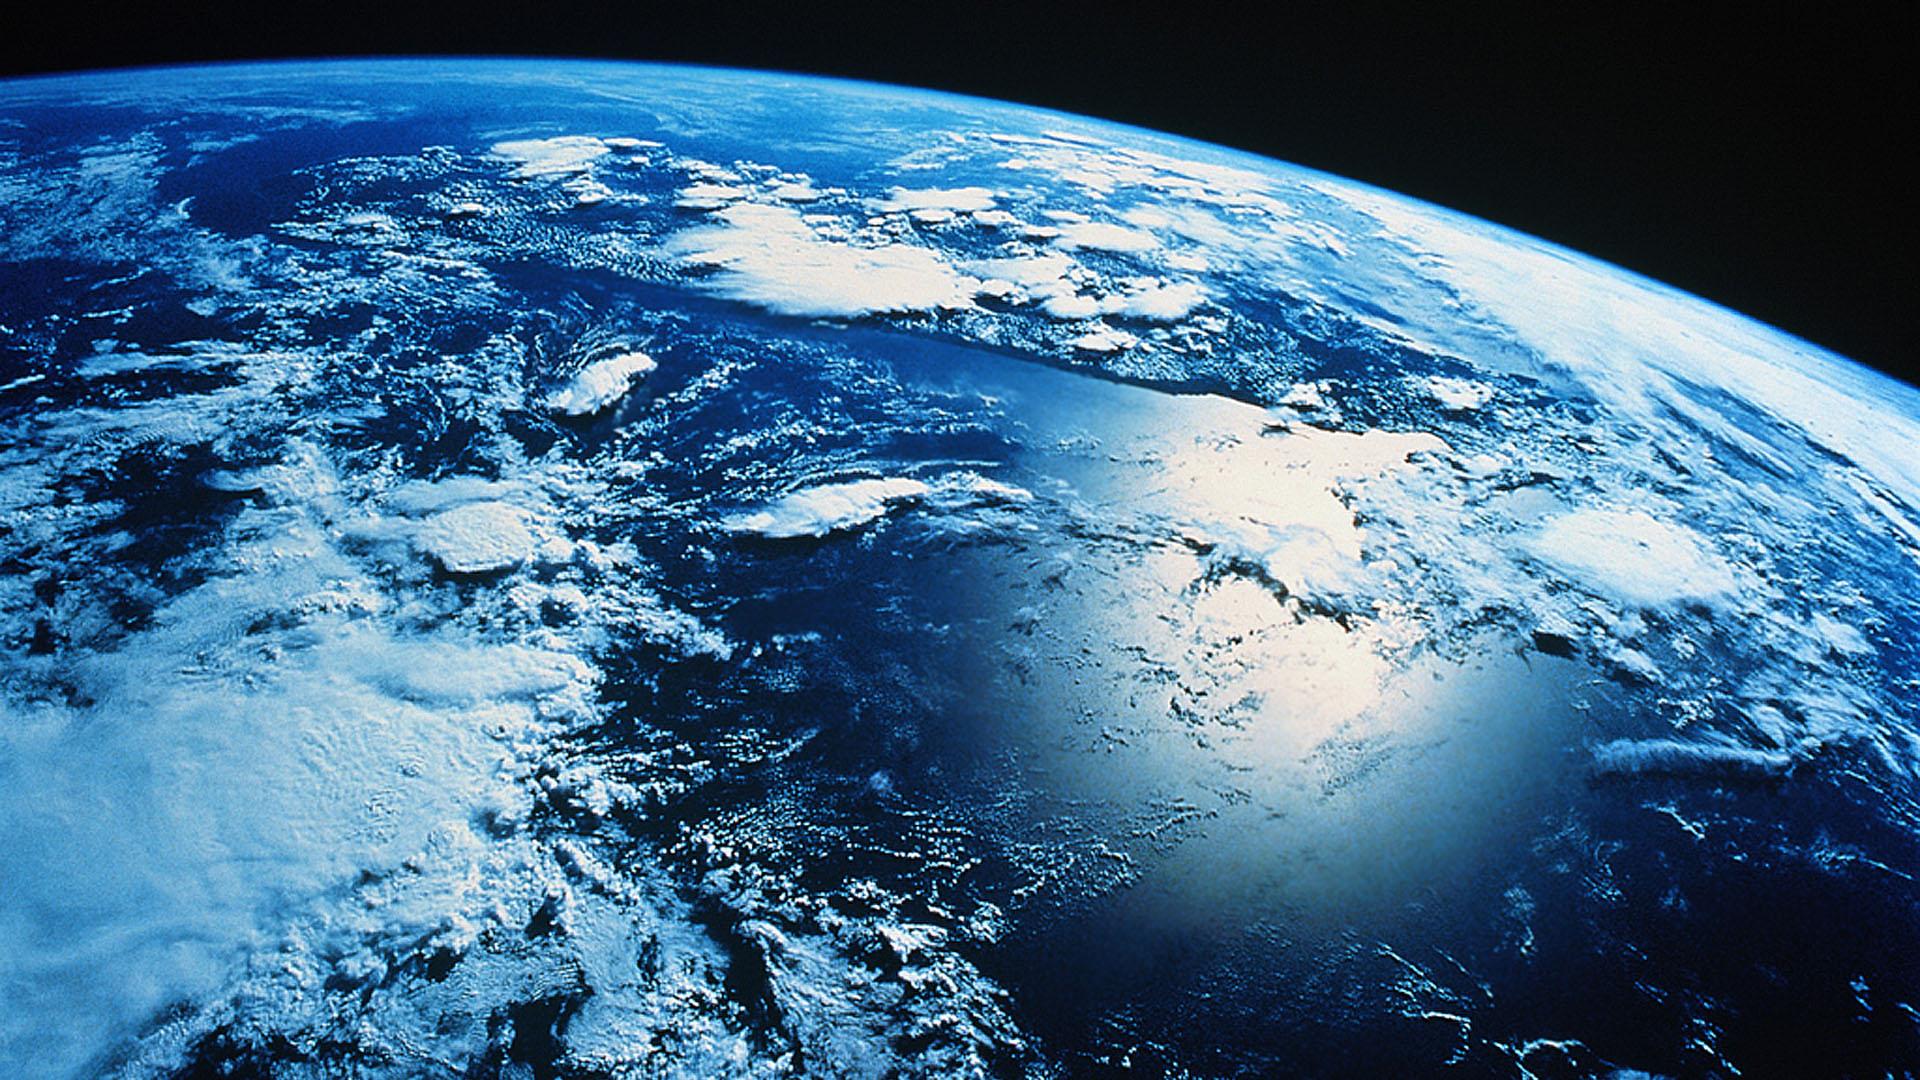 Hollow Earth